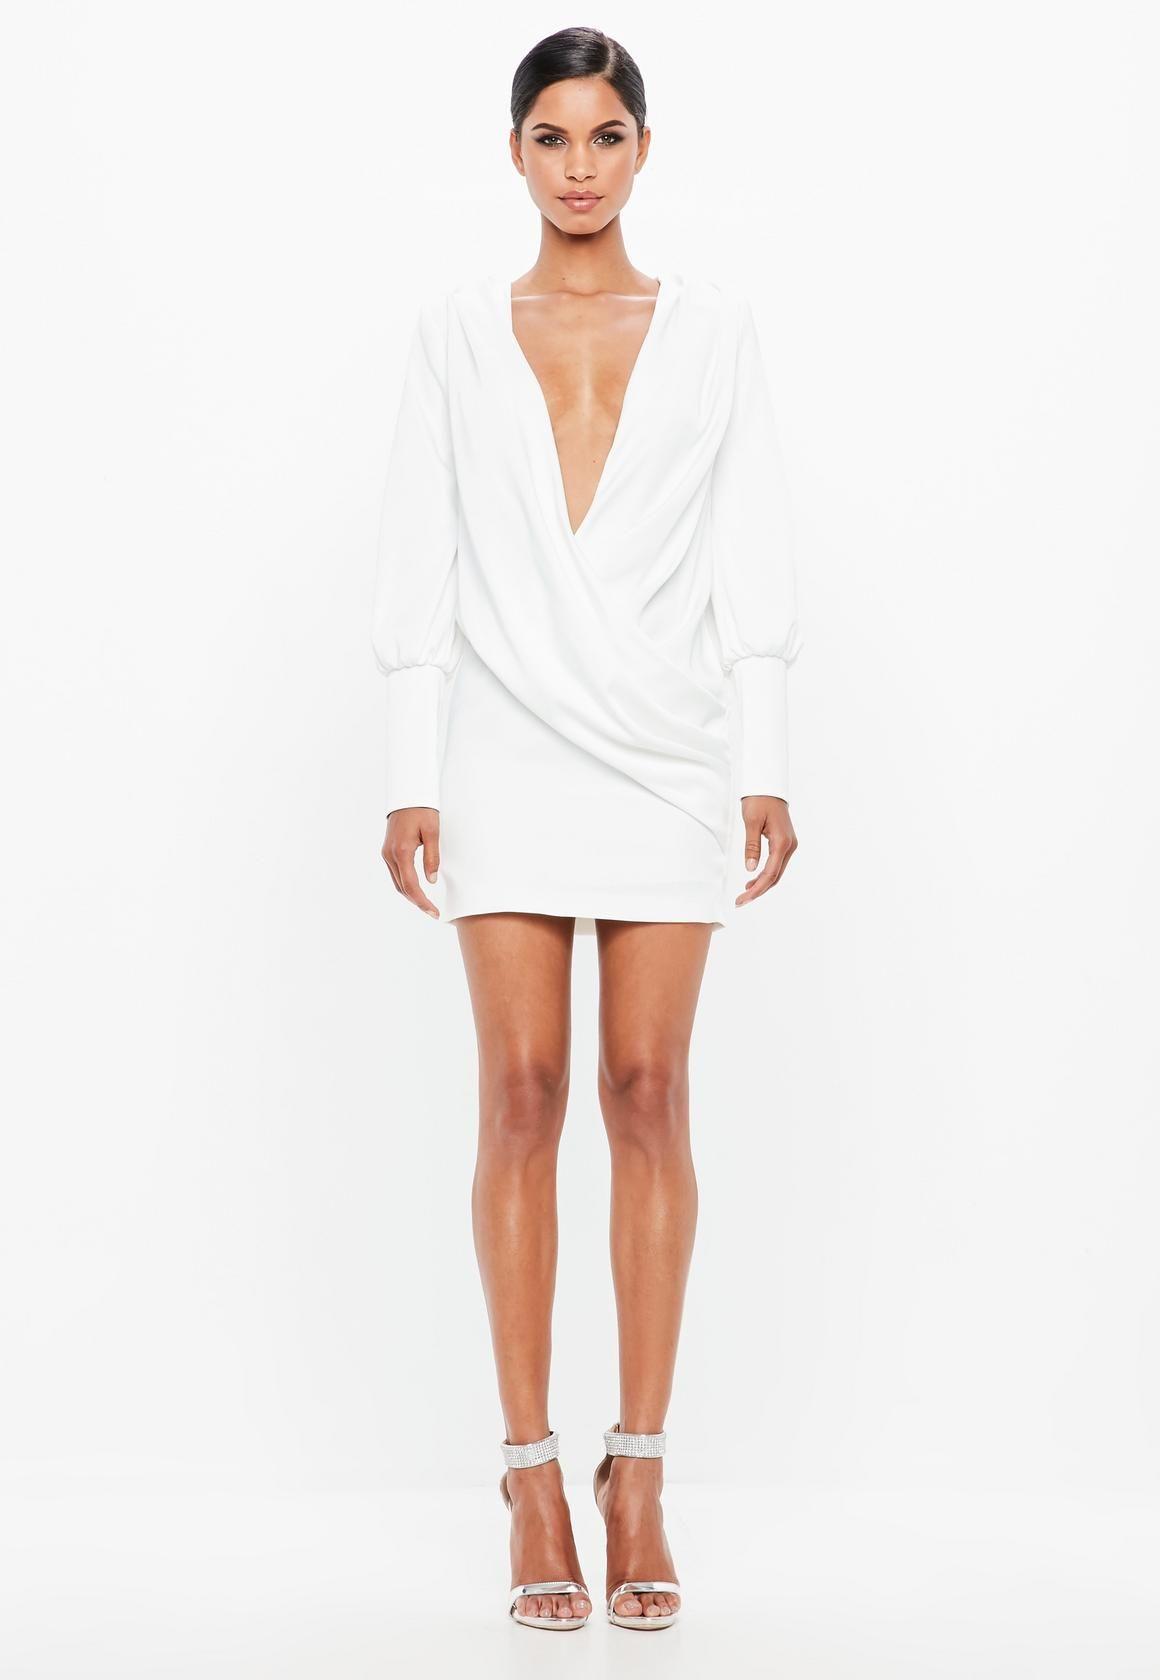 Missguided Peace Love White Wrap Over Cowl Neck Dress Women Dress Online Slinky Mini Dress Skater Dresses Casual [ 1680 x 1160 Pixel ]